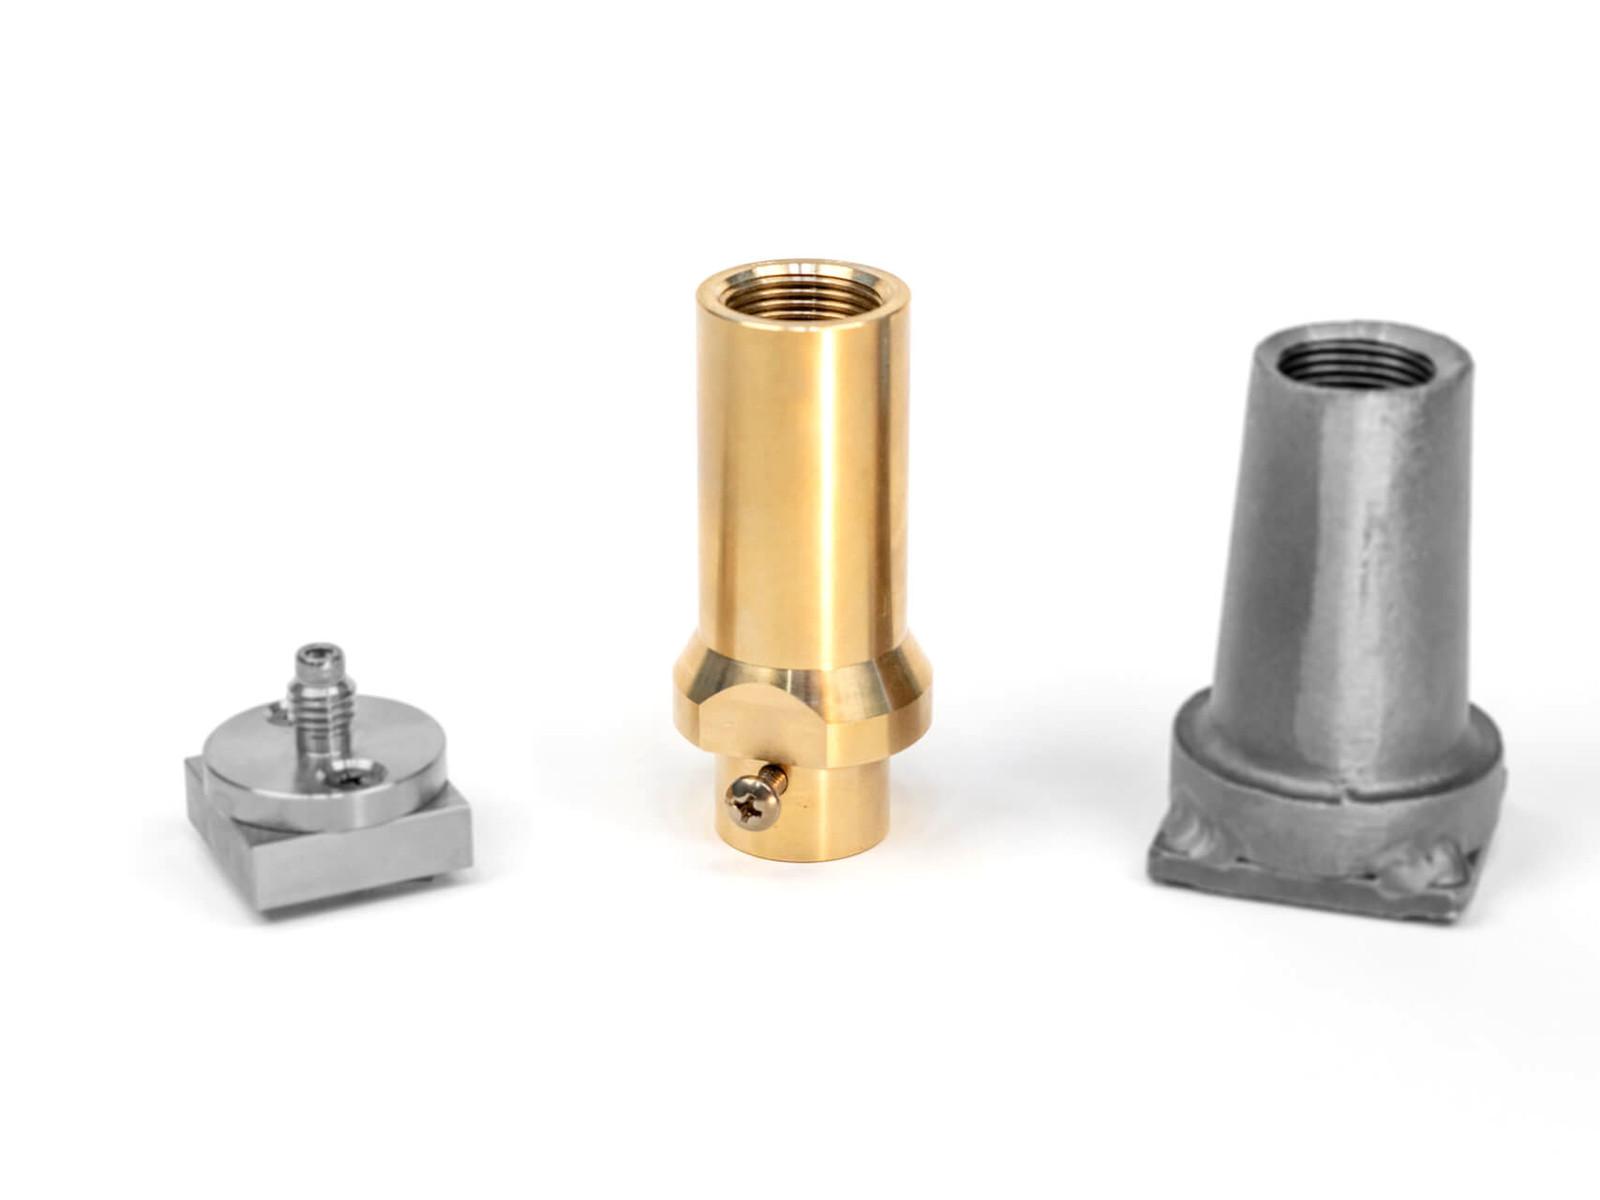 Wallbrand branding iron extra plate adapter